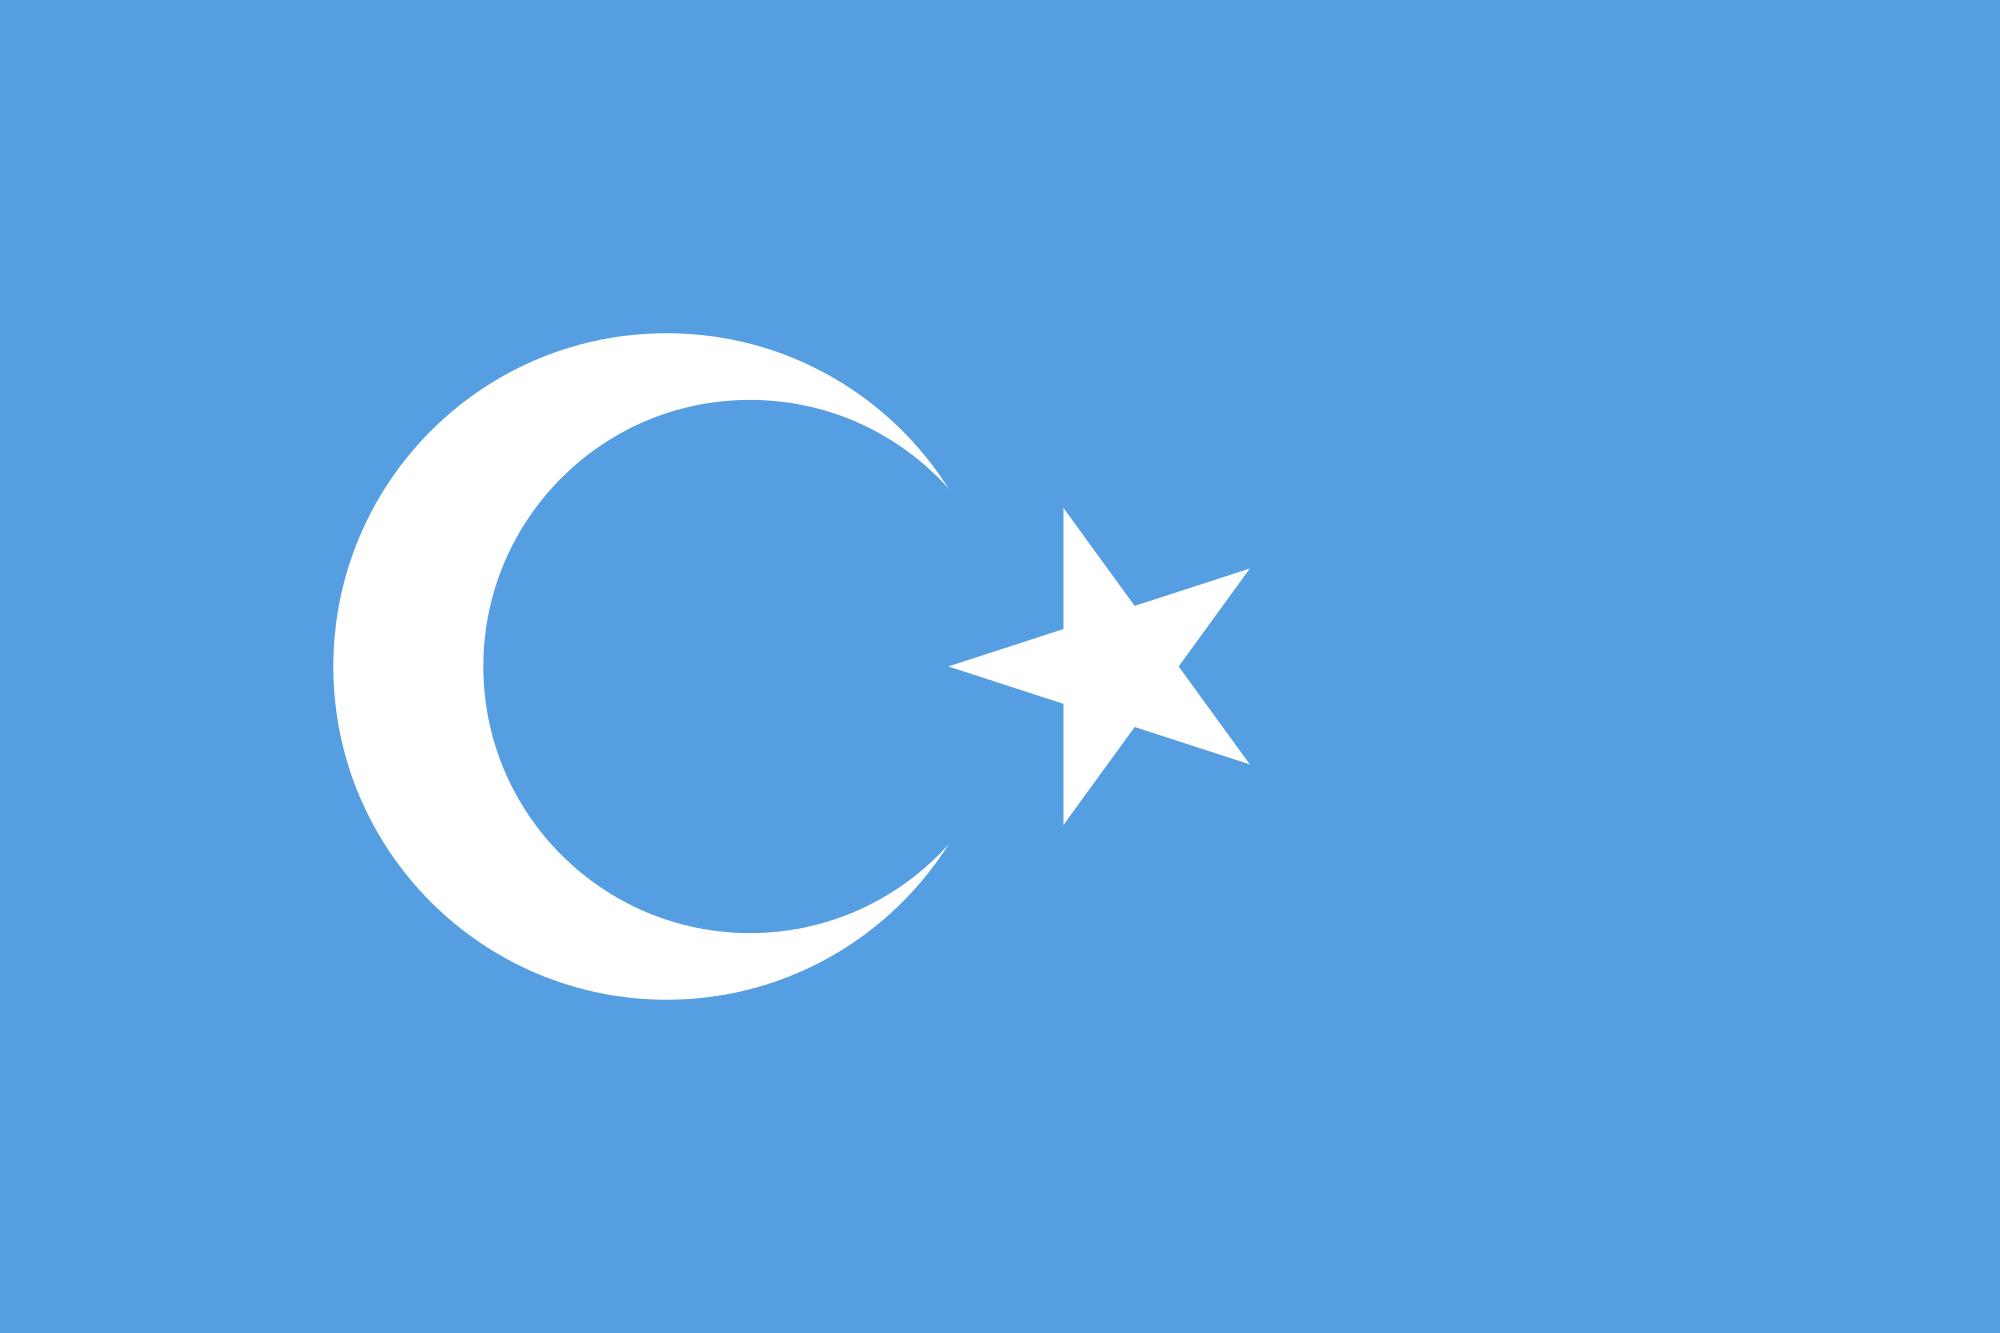 Kokbayraq_flag.svg